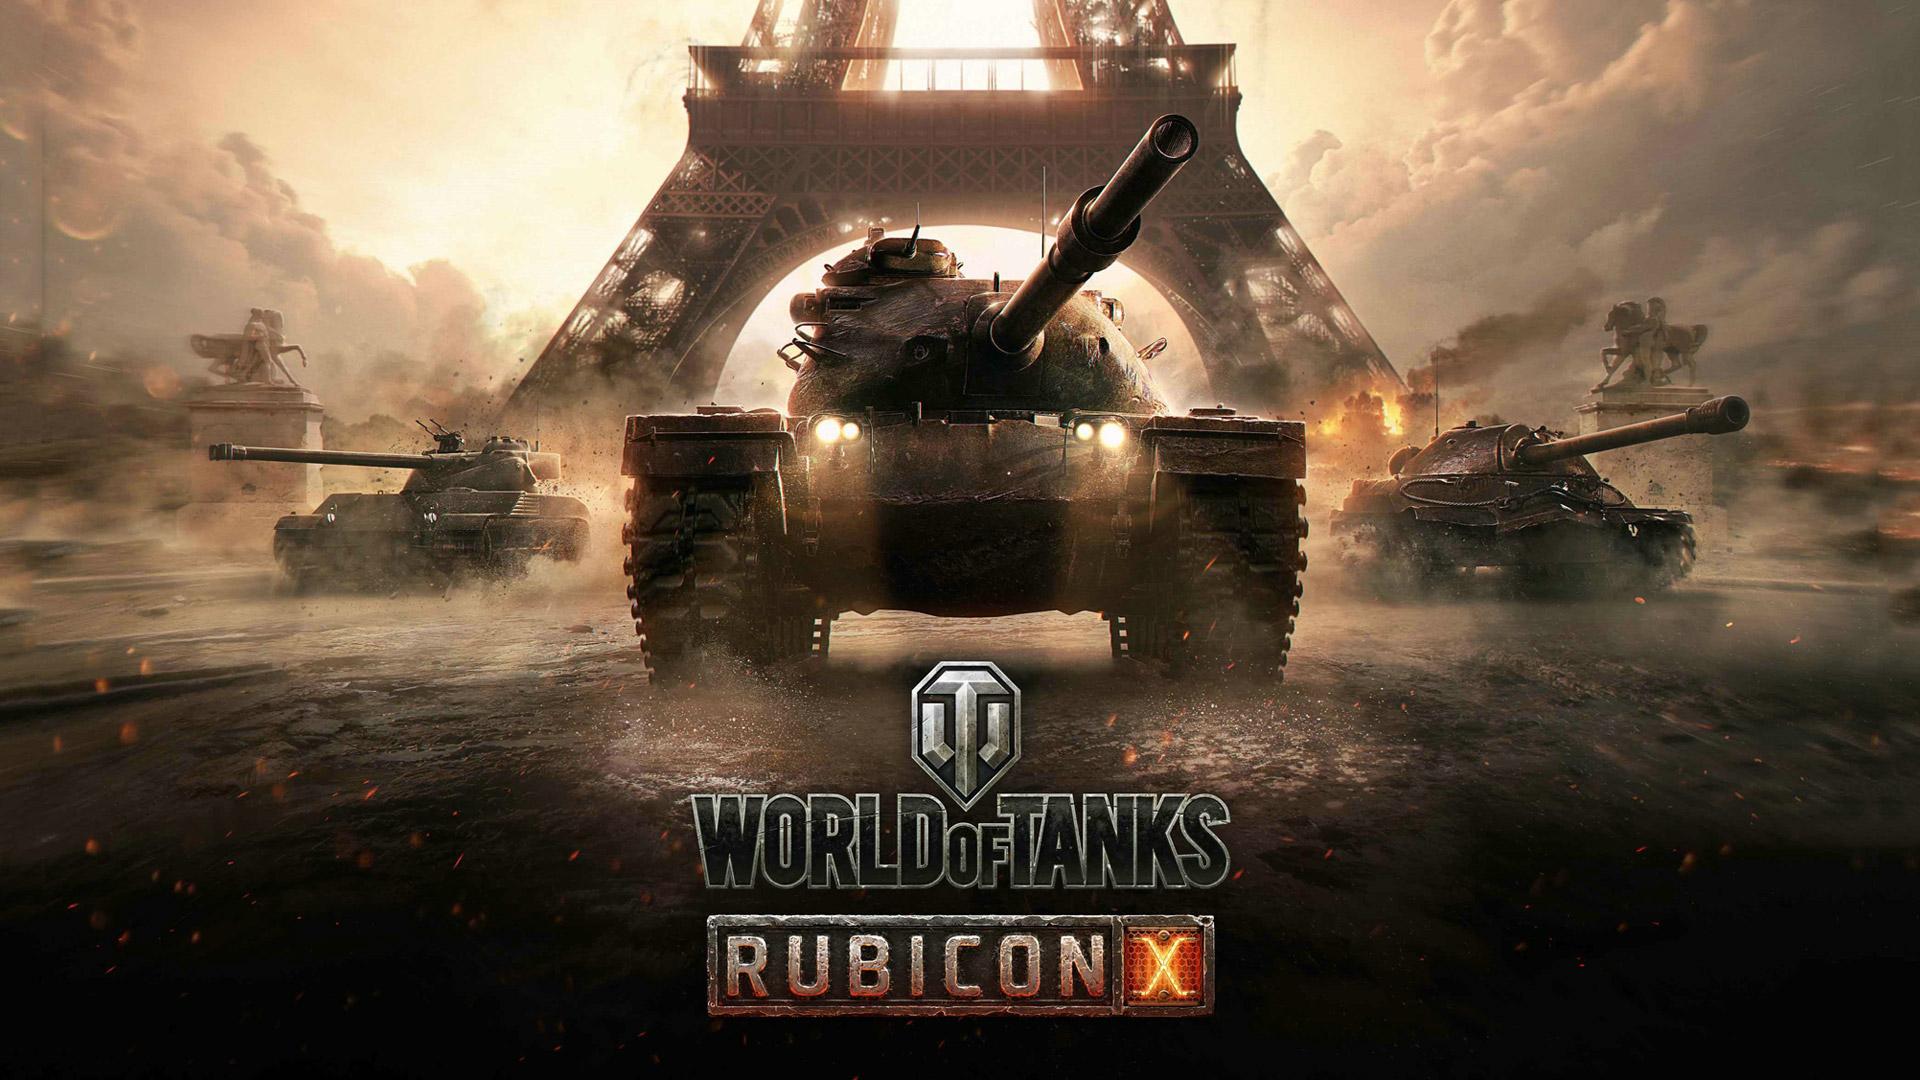 Free World of Tanks Wallpaper in 1920x1080